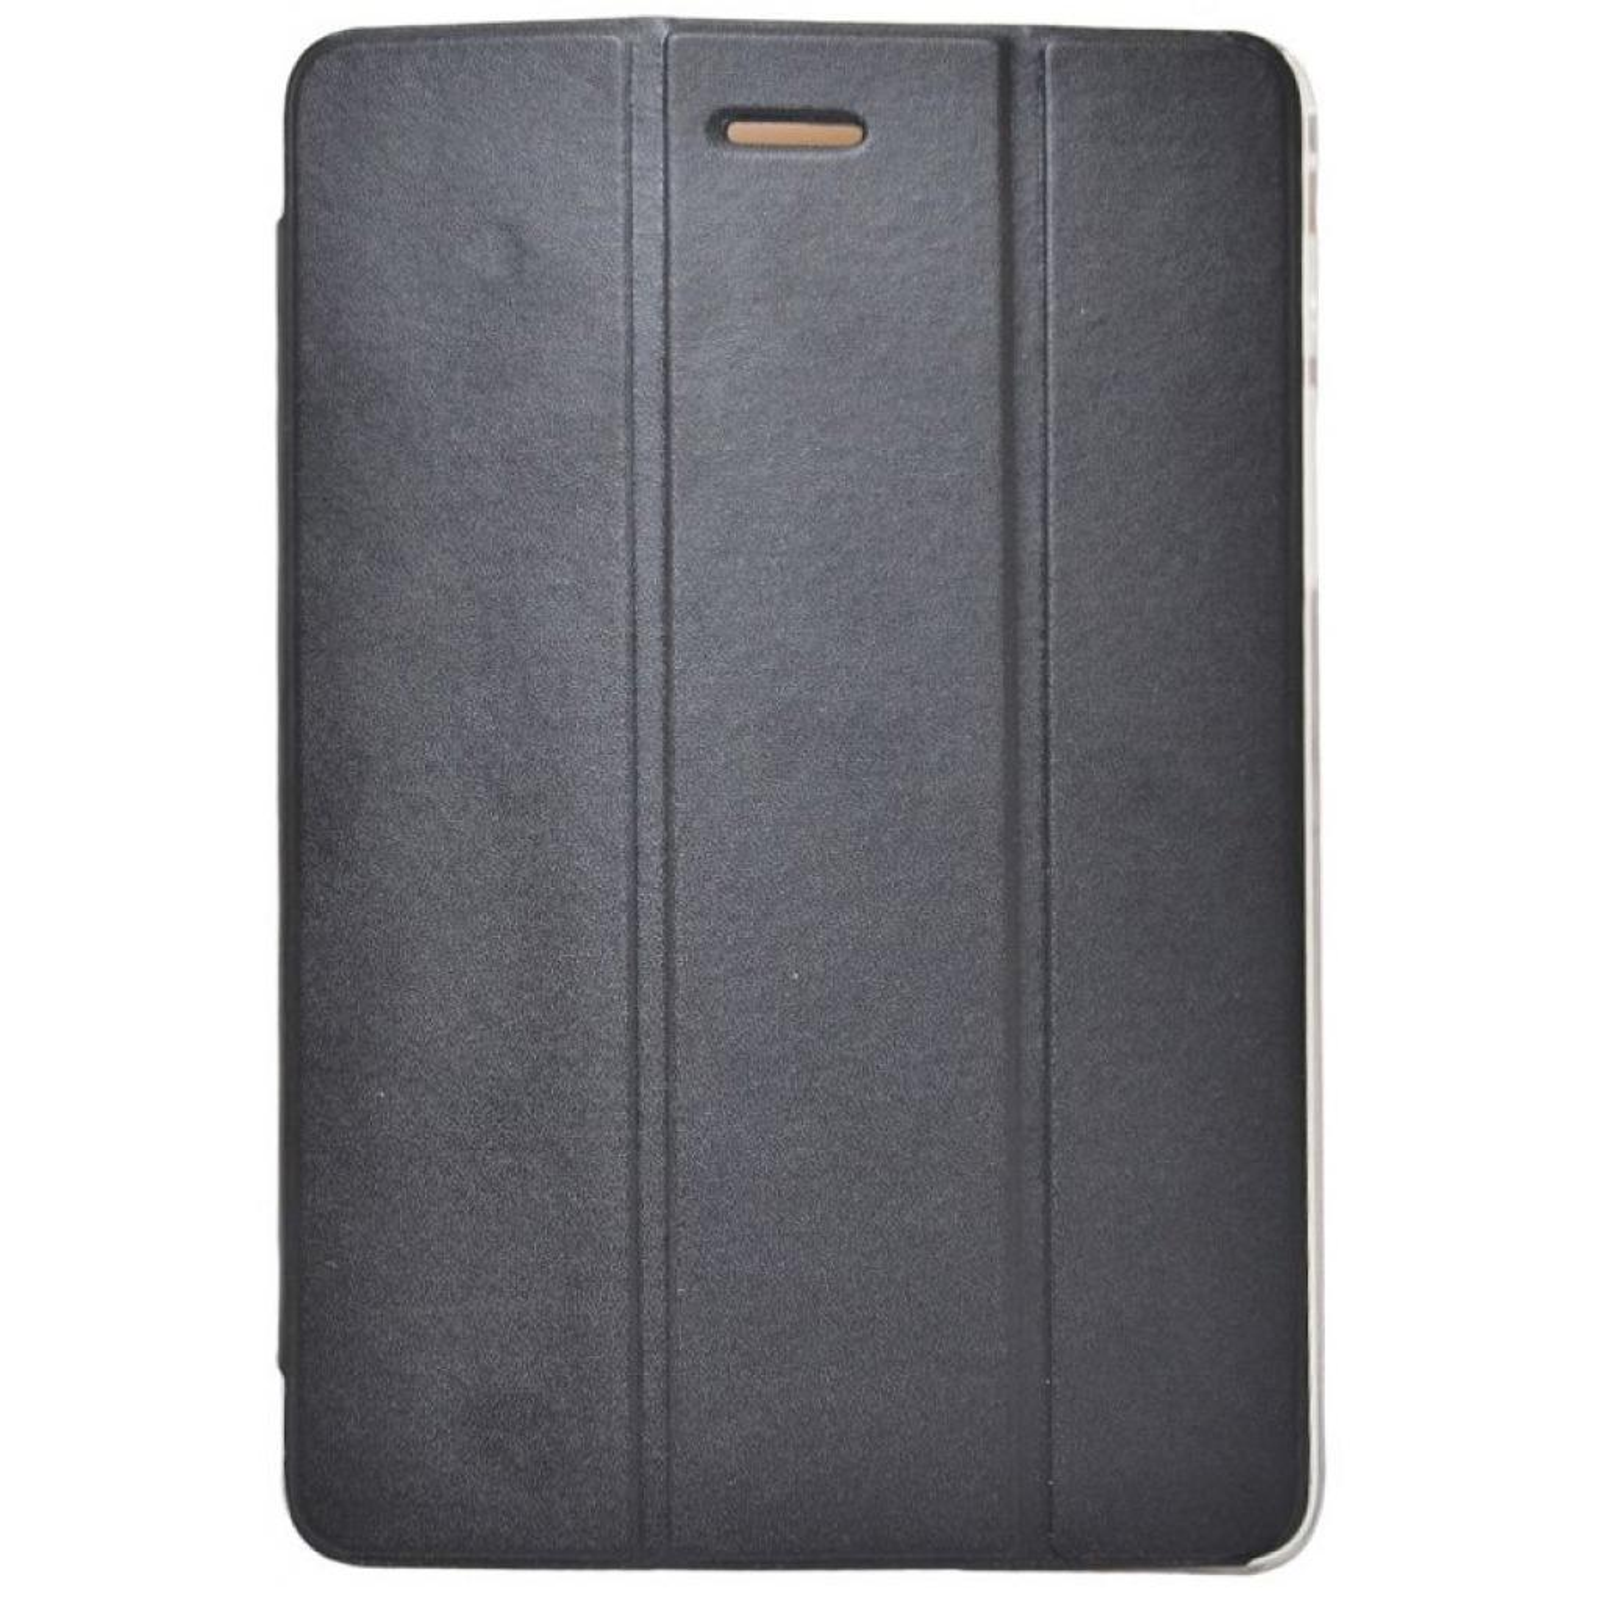 "Чехол для планшета Pro-case 8"" TFC Samsung T350/355(Tab A) Black (PCTFCT350Bl)"